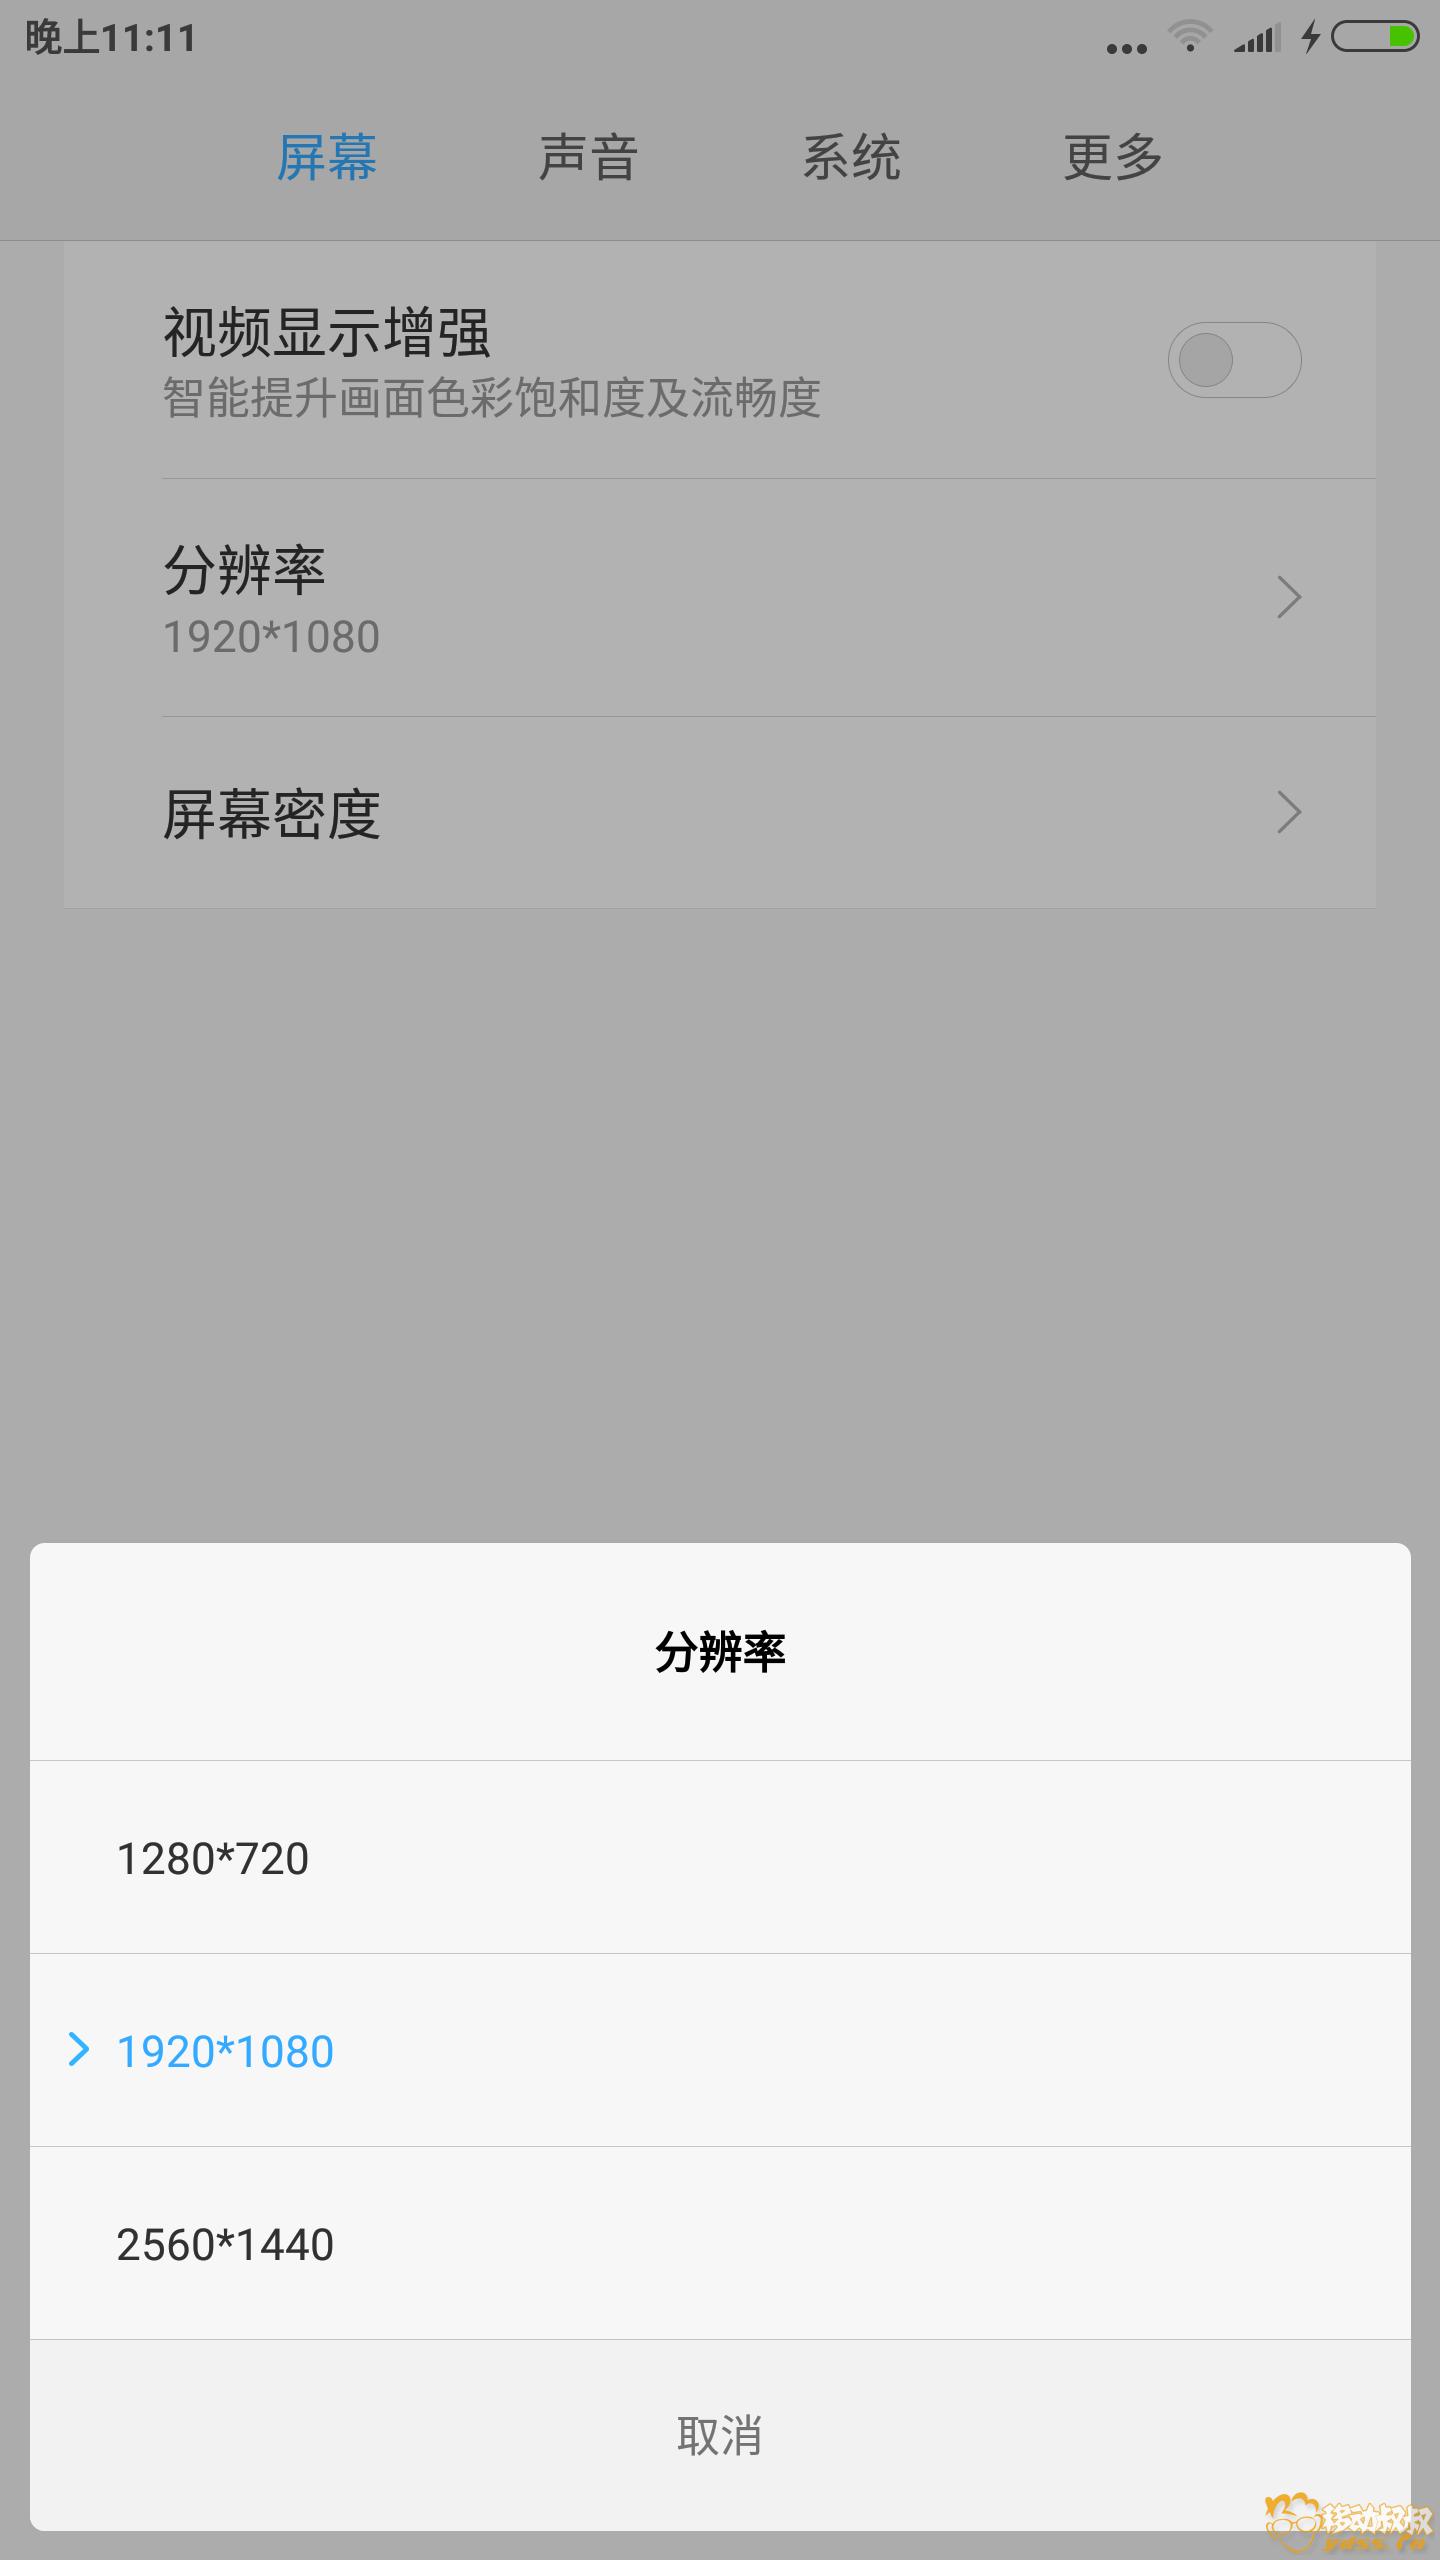 Screenshot_2017-07-11-23-11-44-780_com.nian.miworkers.png